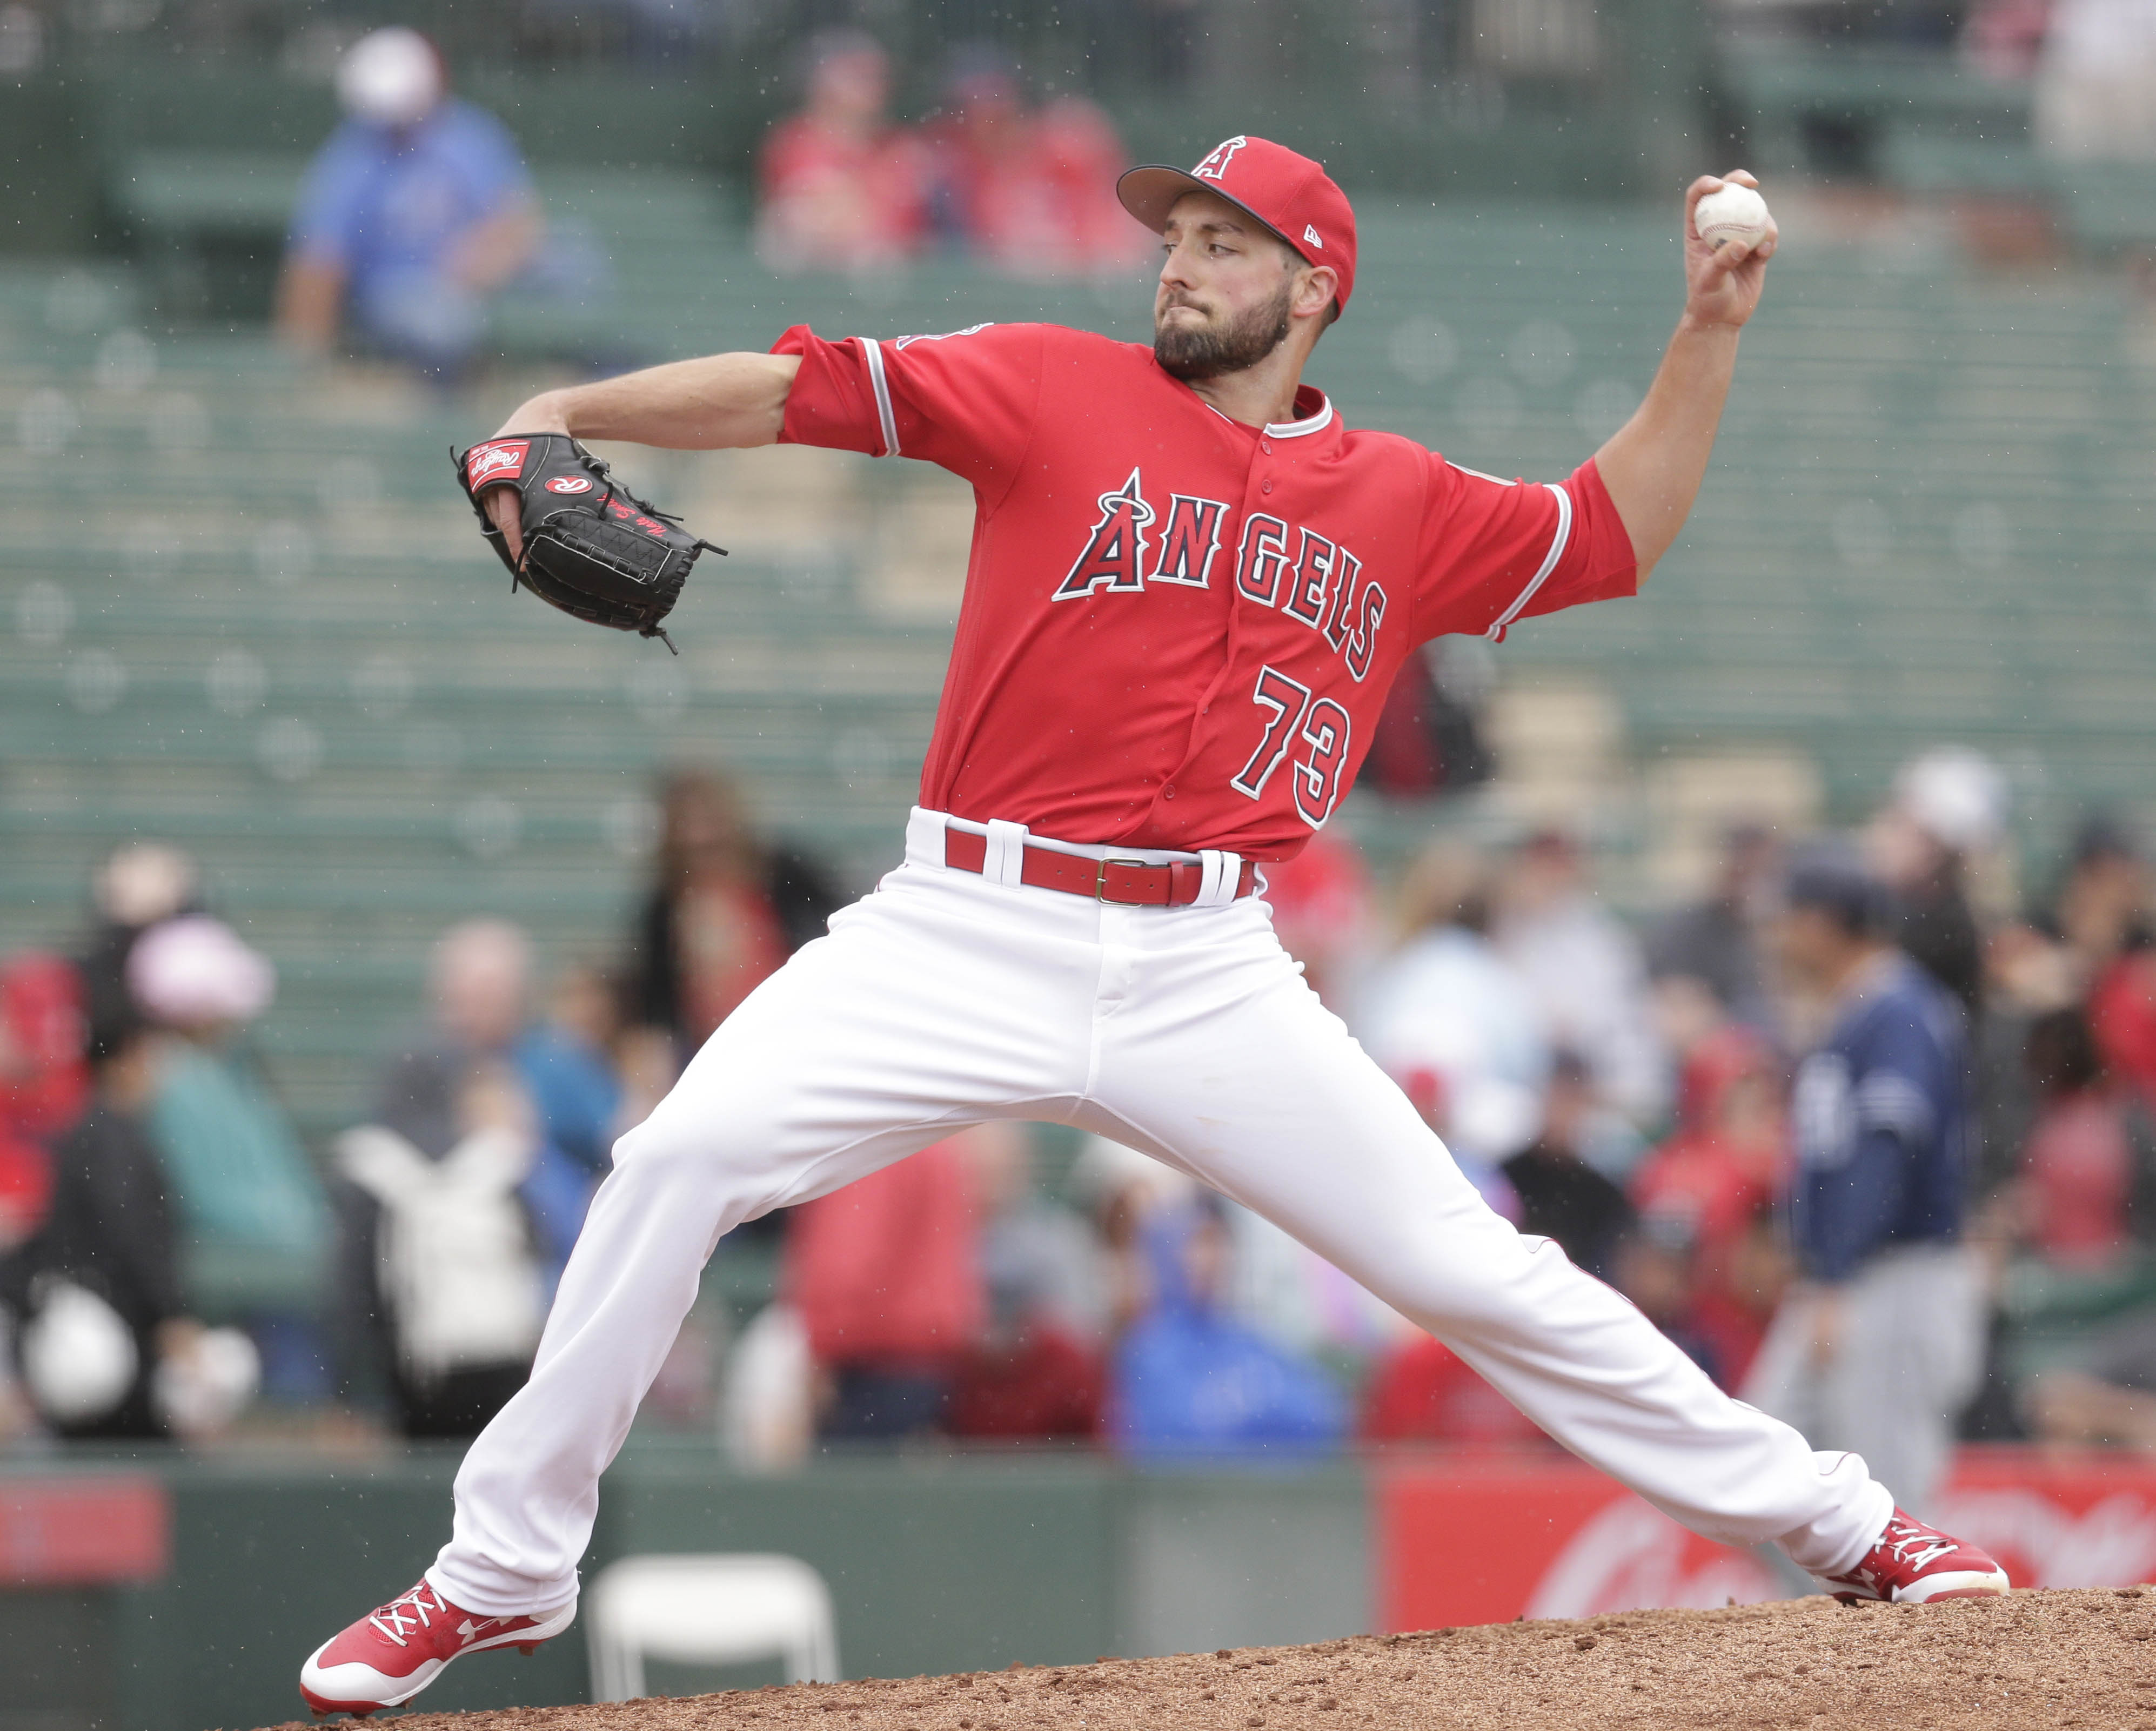 Fantasy Baseball: Under the radar AL West prospects - Page 2